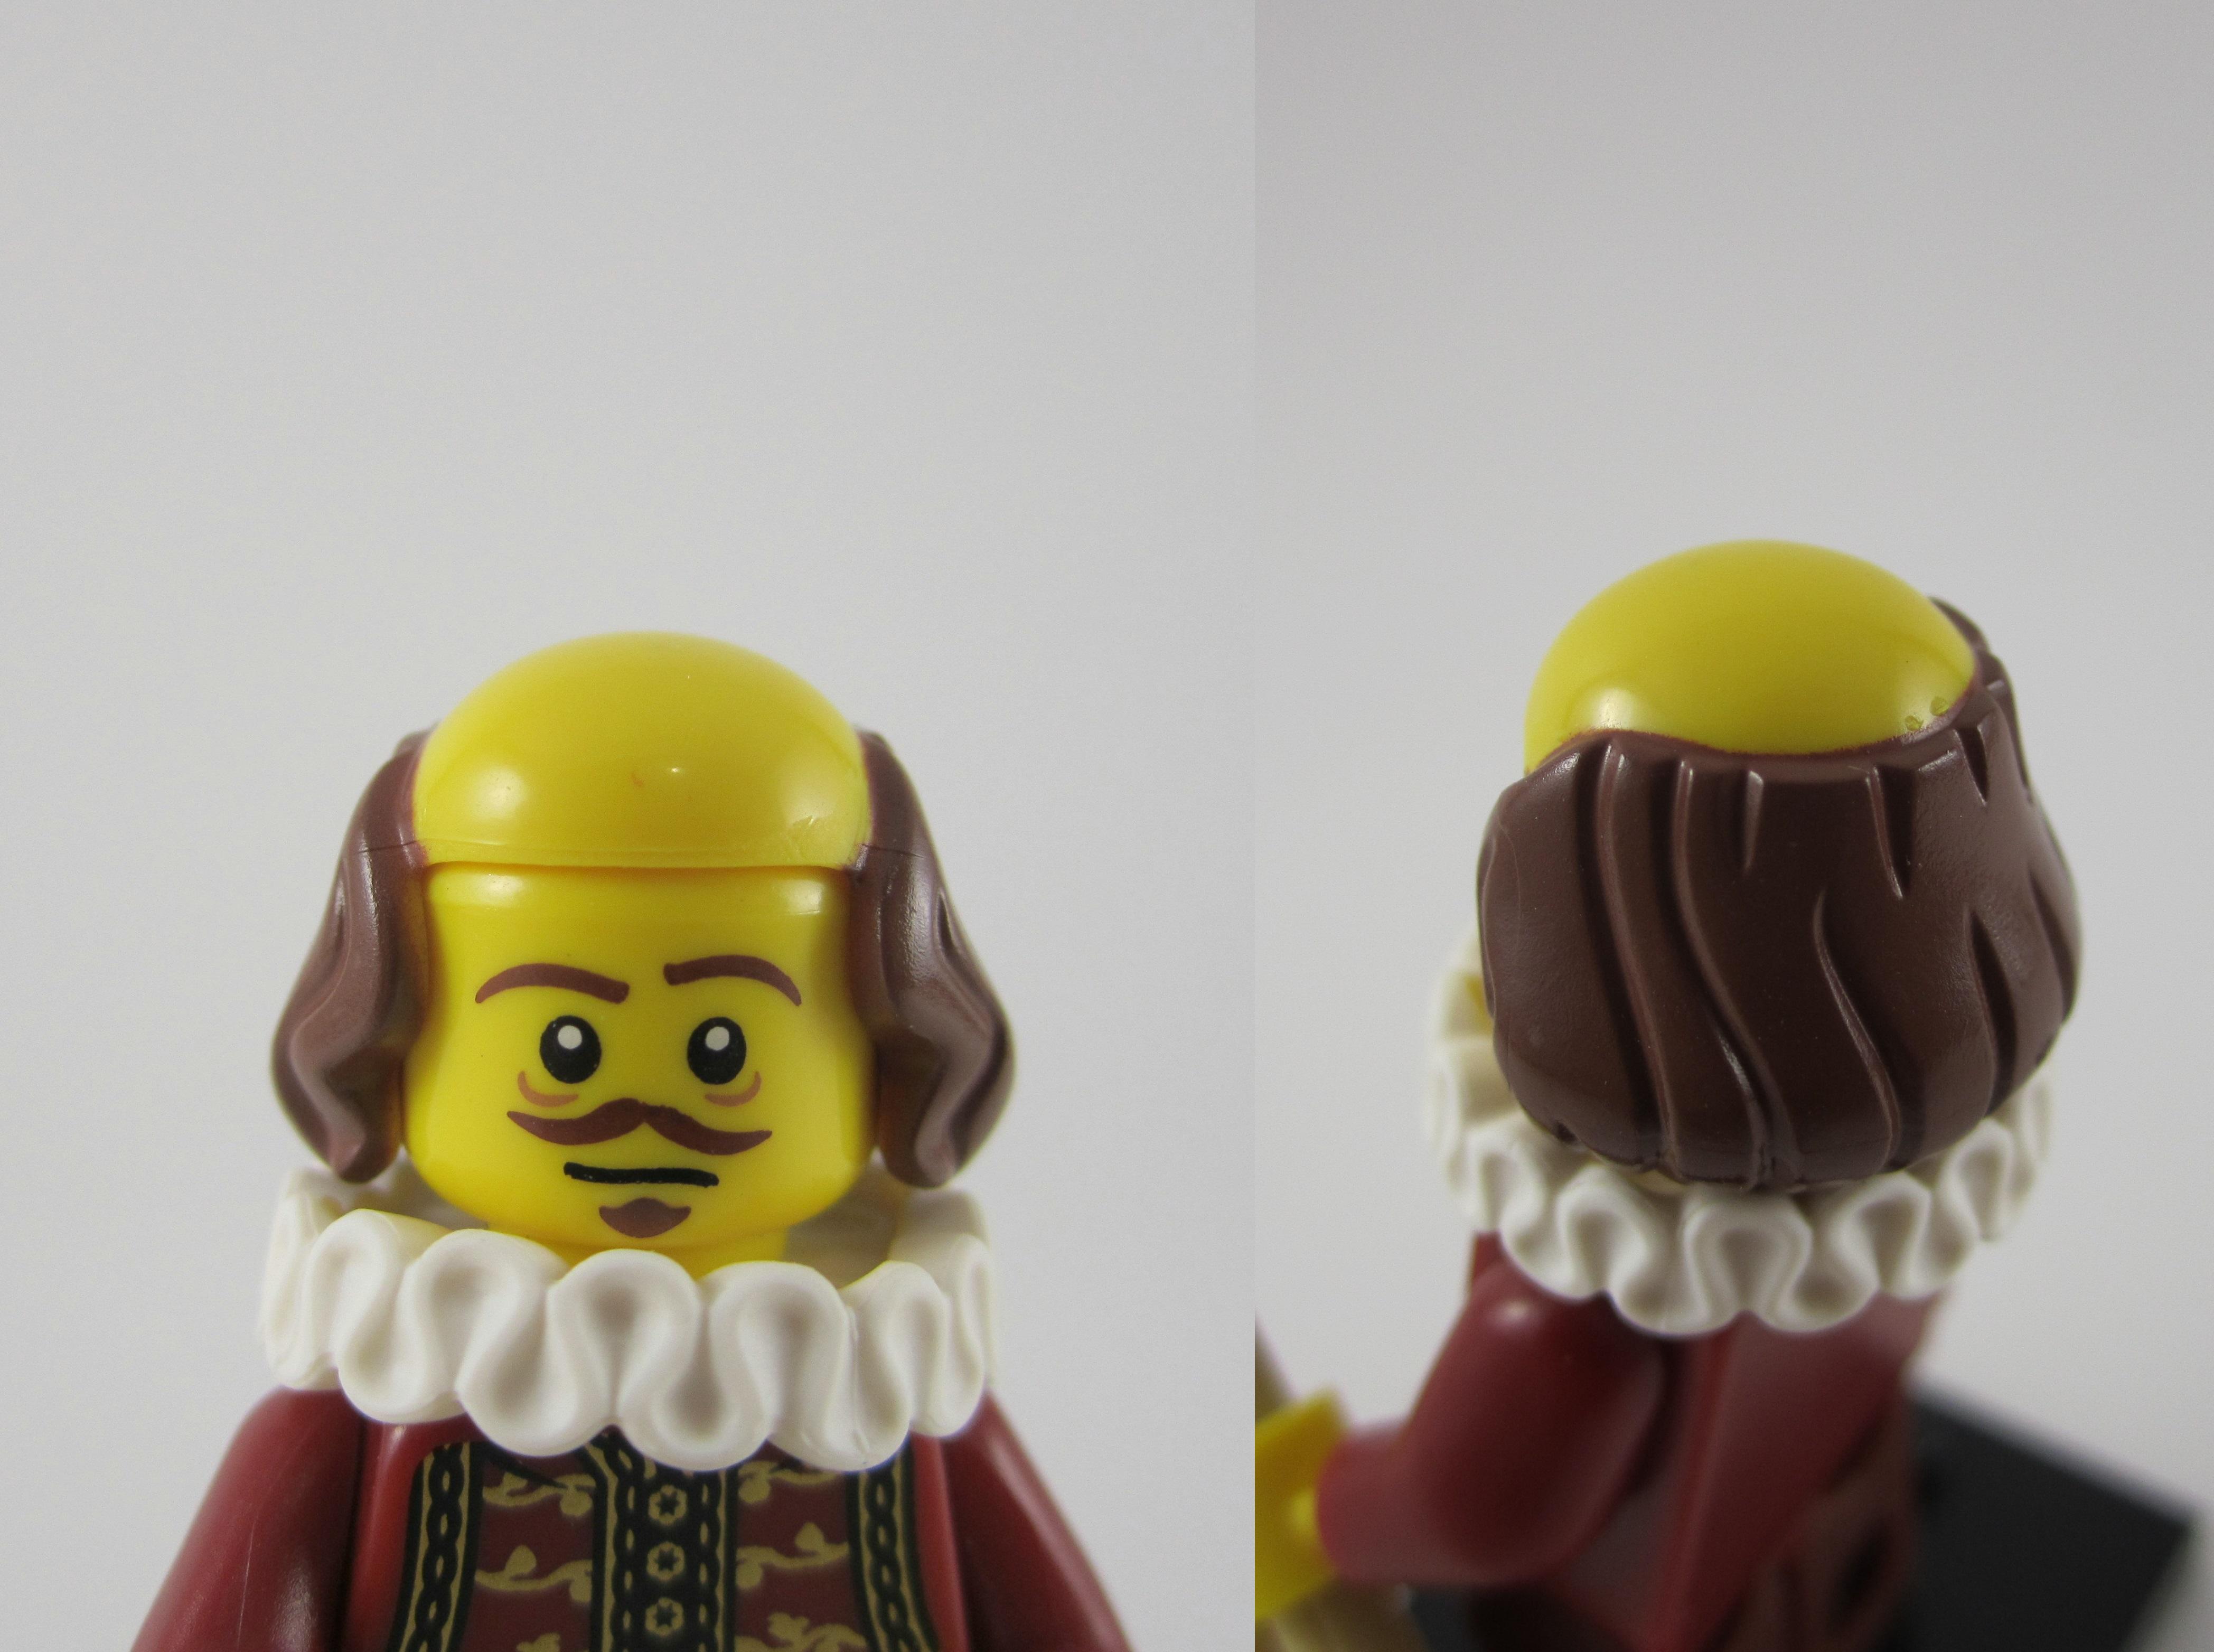 Lego Movie William Shakespeare Head 2